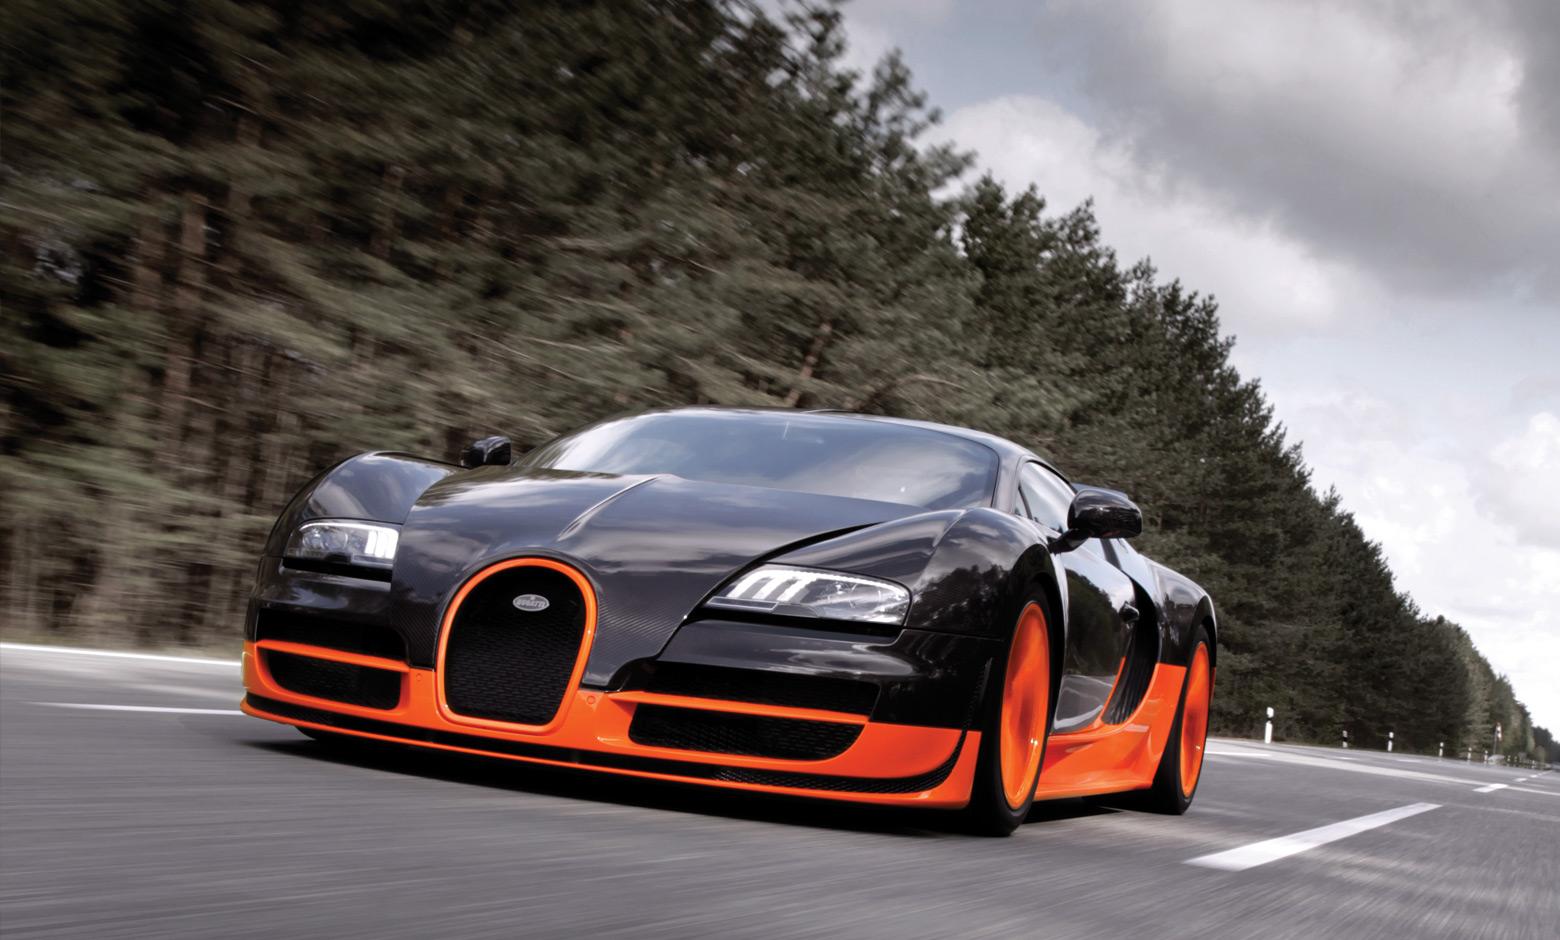 How much money is a bugatti